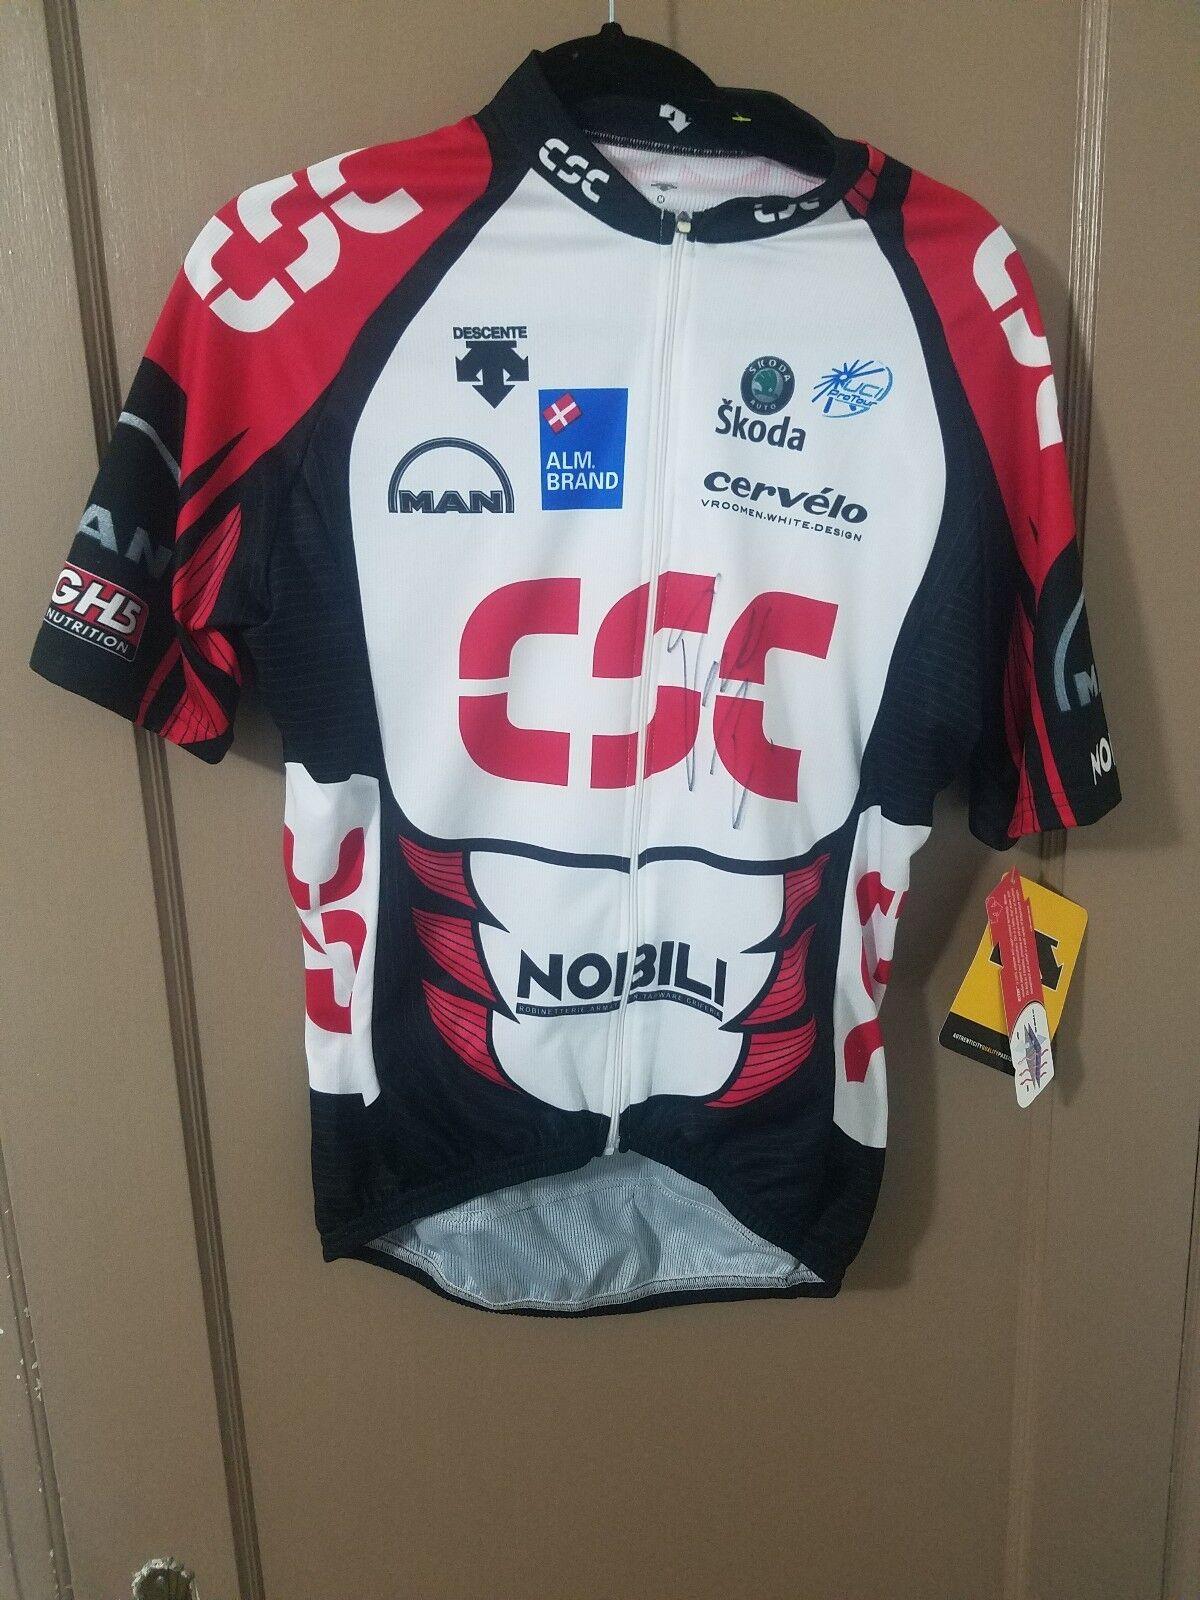 CSC DESCENTE cycling jersey SIGNED BY David Zabriskie  M MENS.